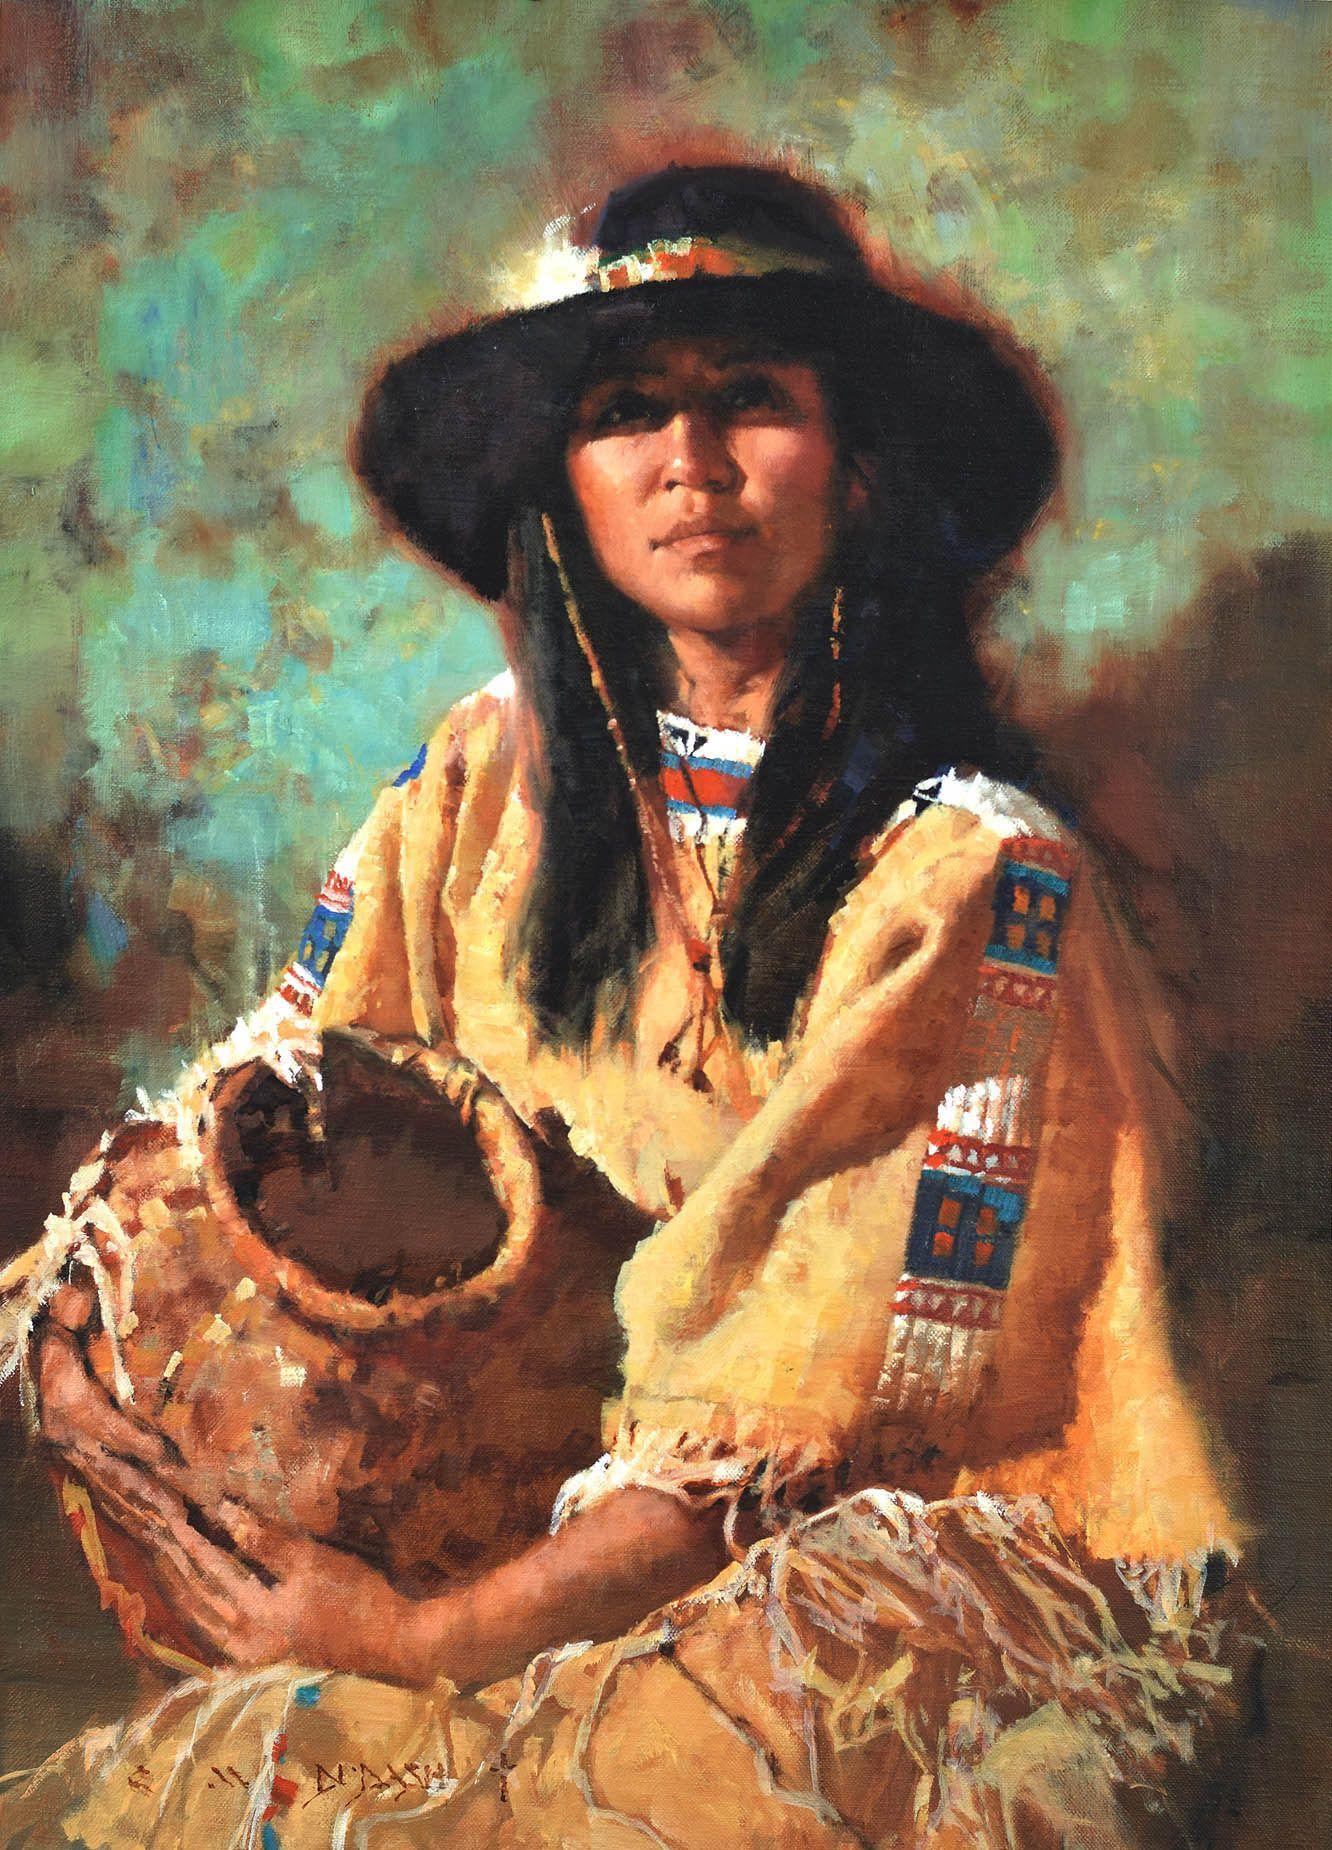 """SERENITY"" Artist C. Michael Dudash Native american art"